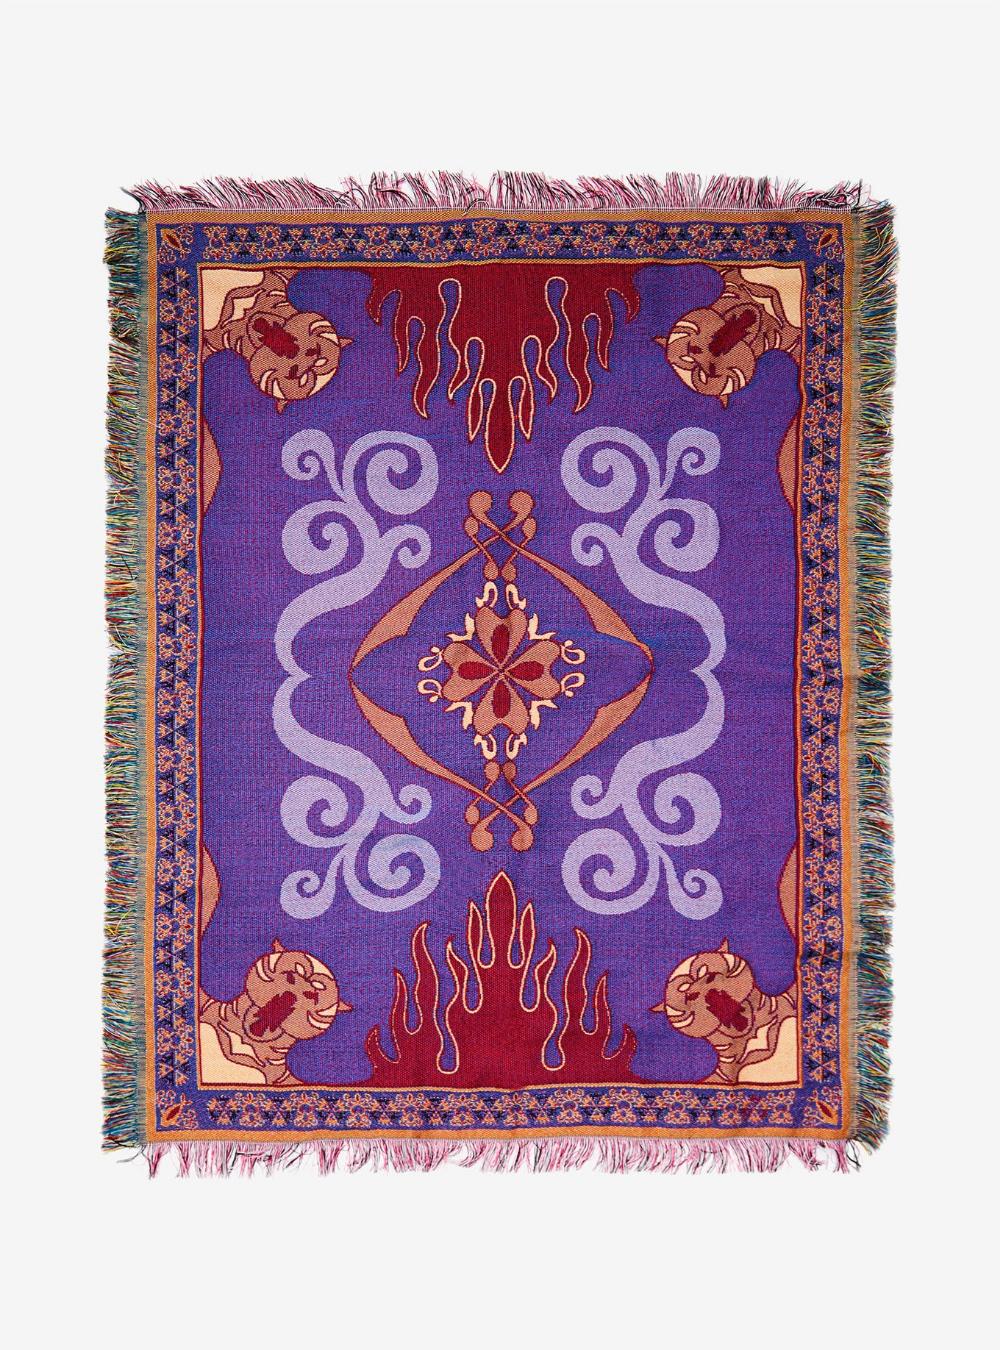 Disney Aladdin Magic Carpet Woven Tapestry Throw Blanket Aladdin Magic Carpet Tapestry Throw